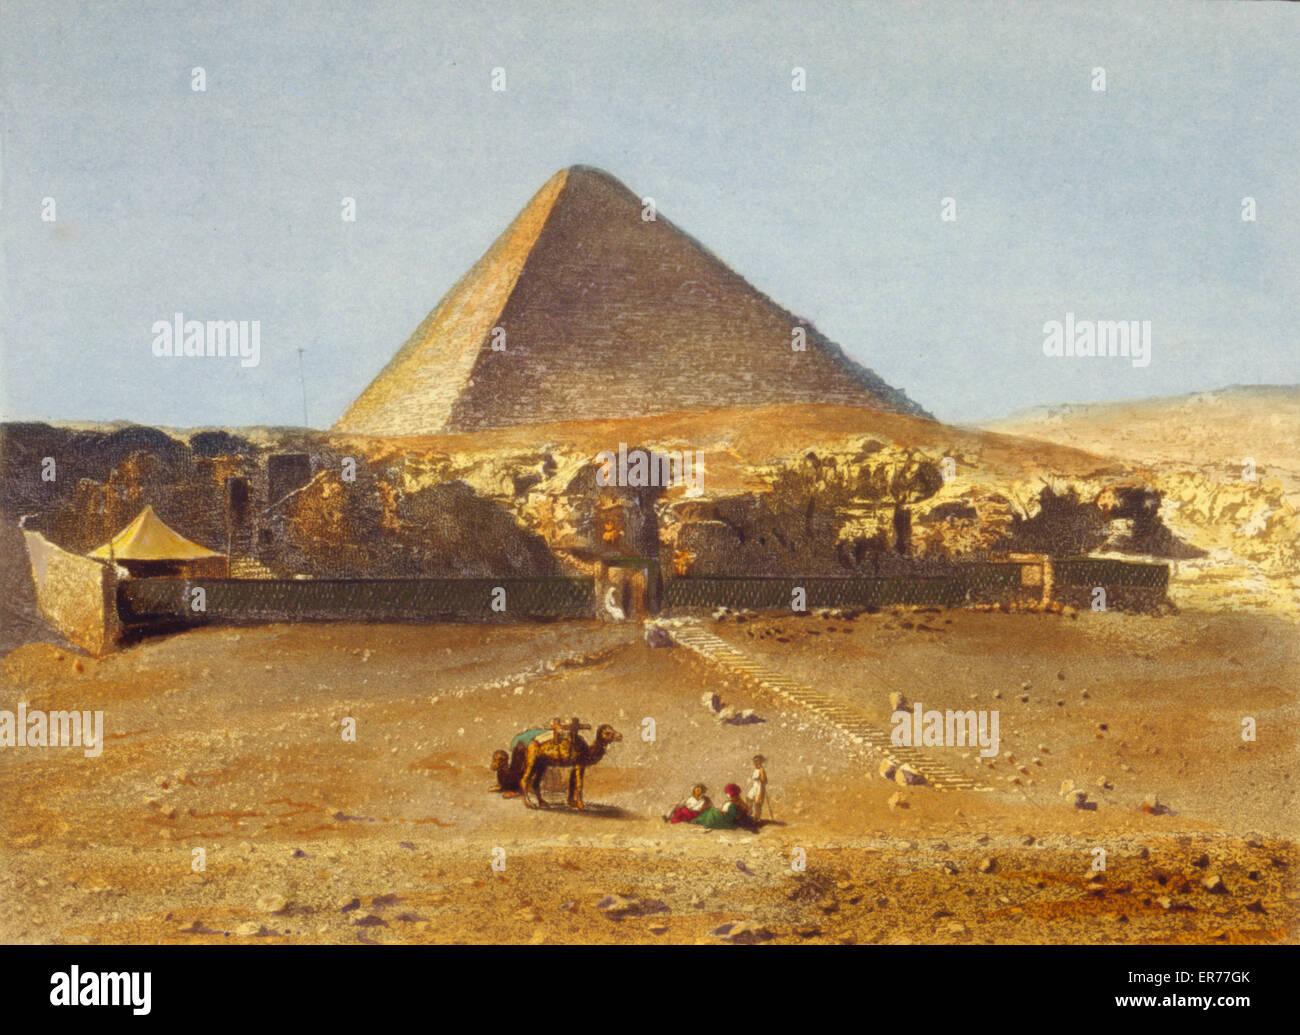 dating pyramider